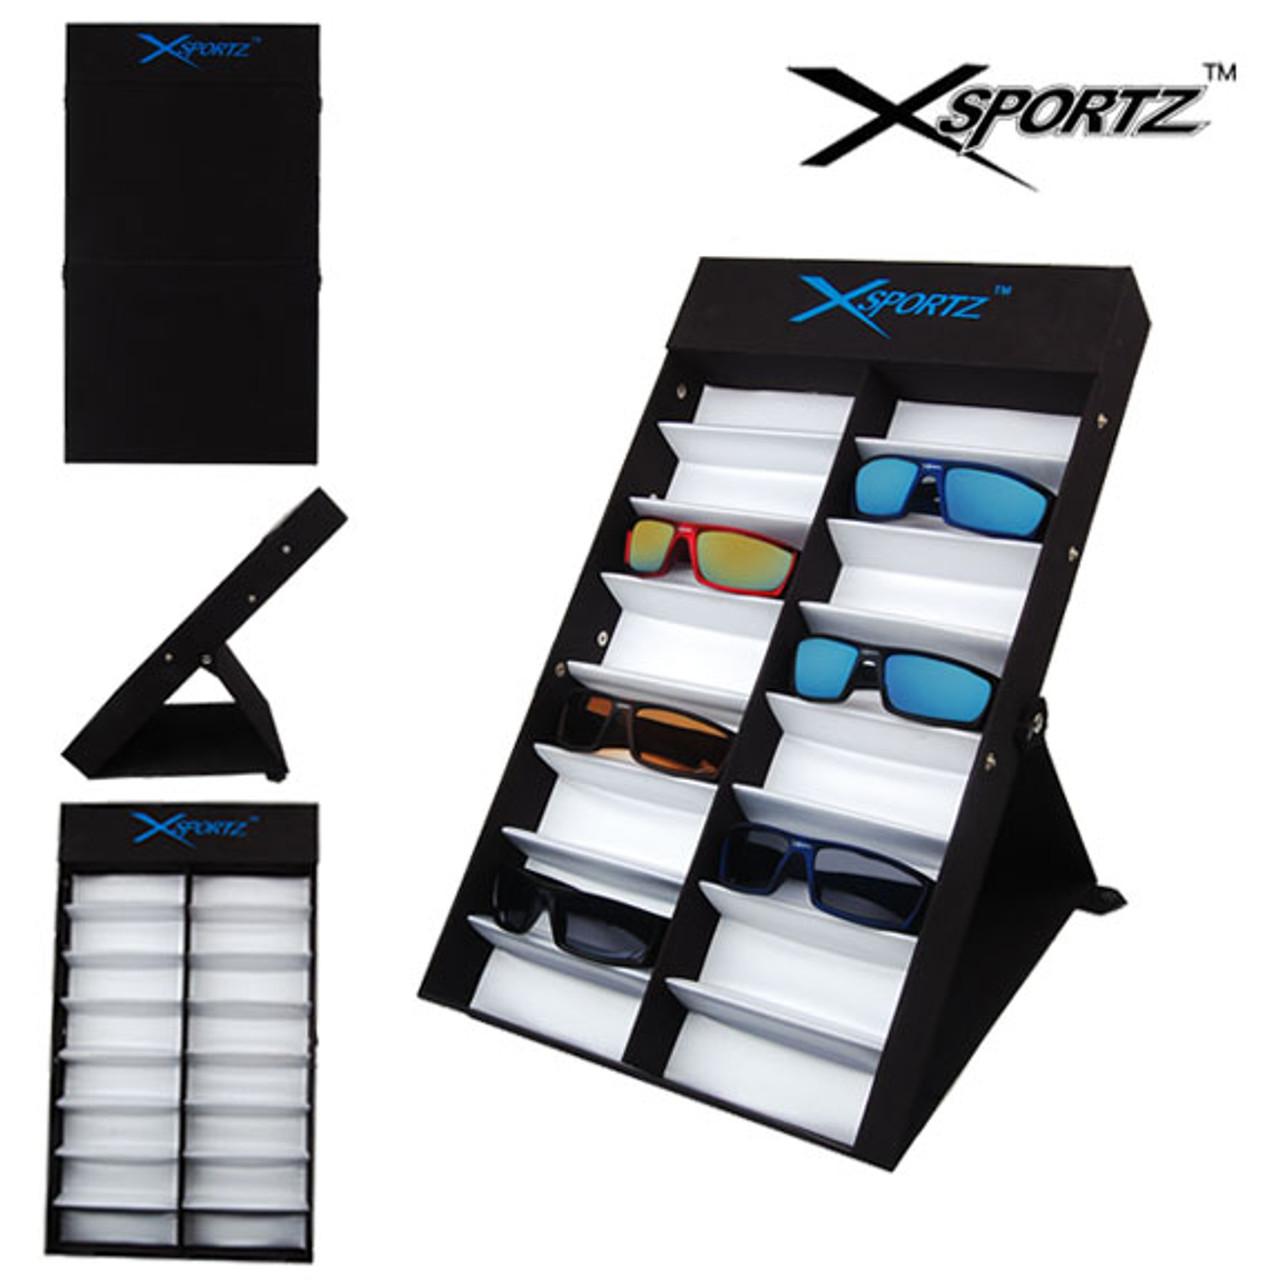 Xsportz Folding Sunglass Display